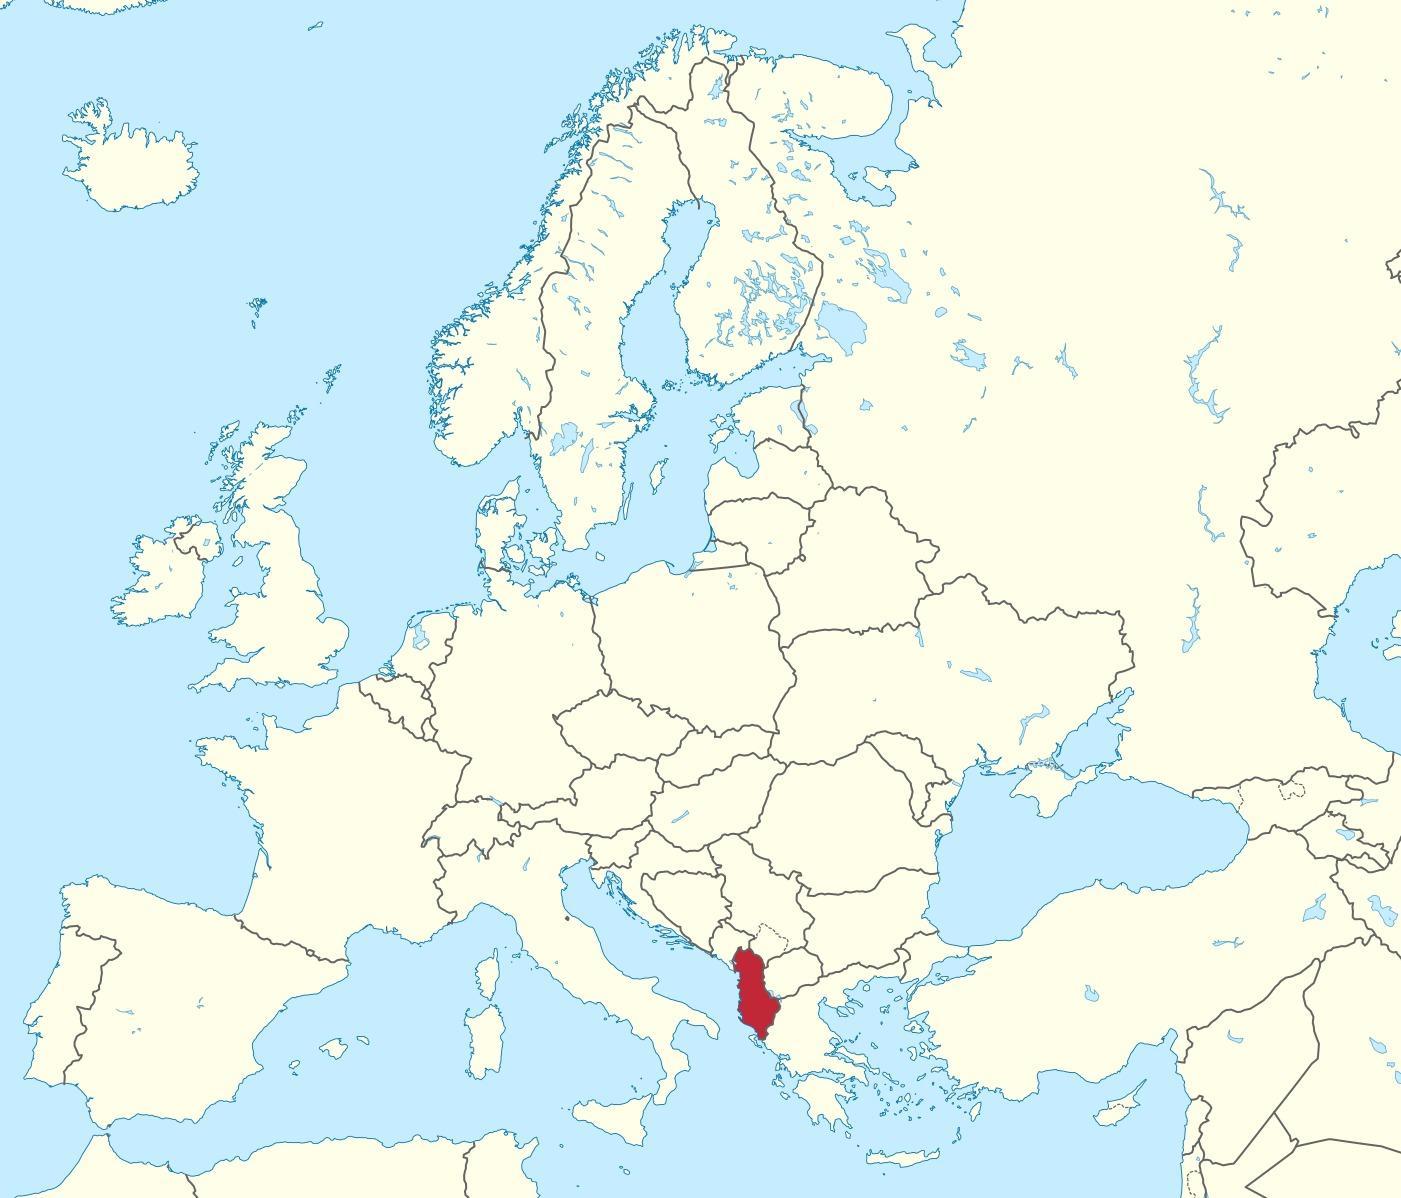 Albania On Euroopan Kartta Kartta Albanian Euroopan Etela